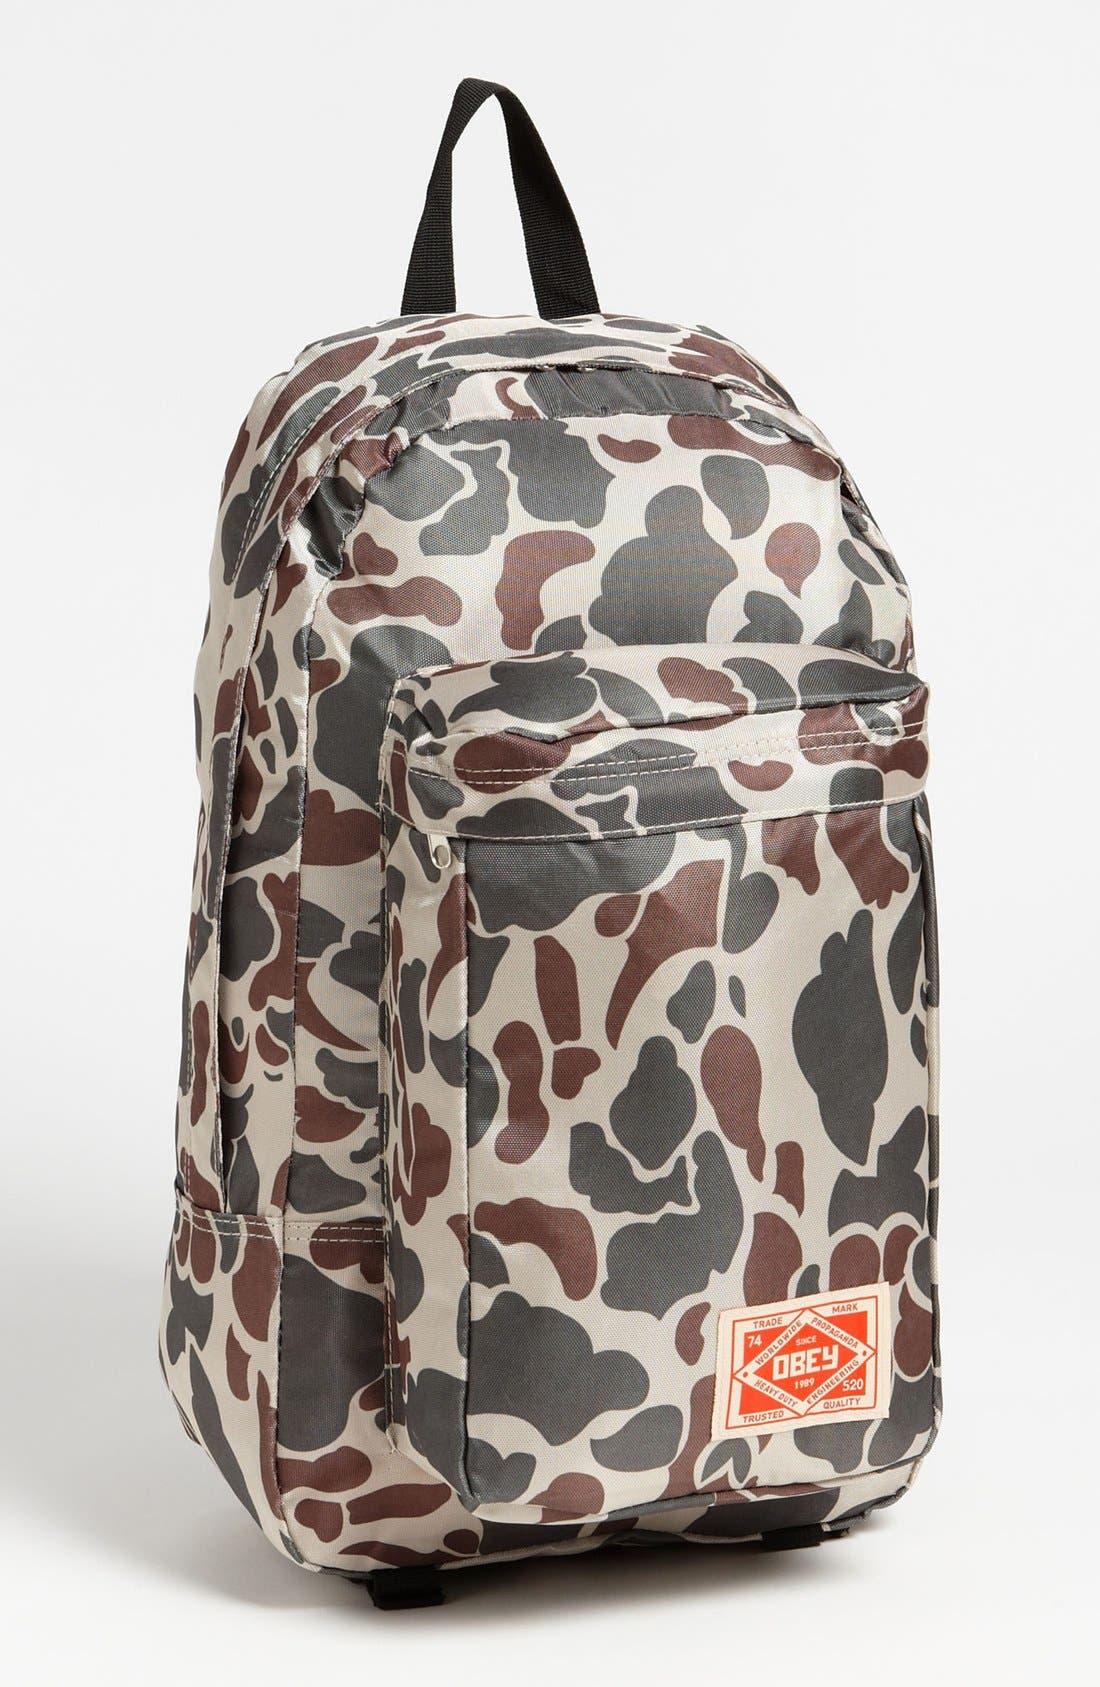 Alternate Image 1 Selected - Obey 'Commuter' Backpack